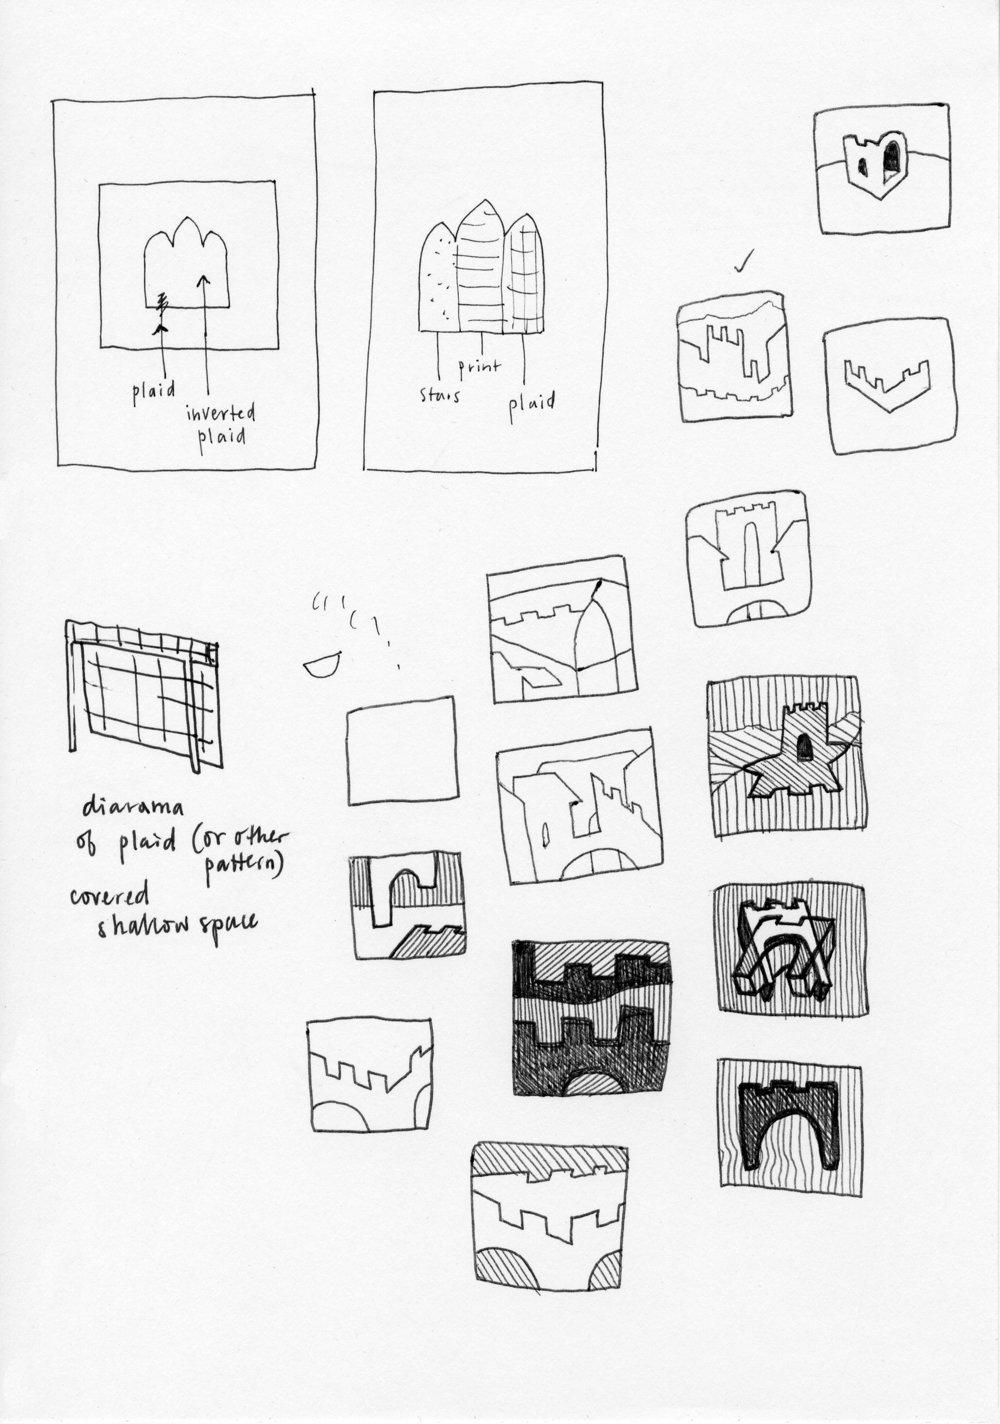 juleit furst SHP sketch1.jpg